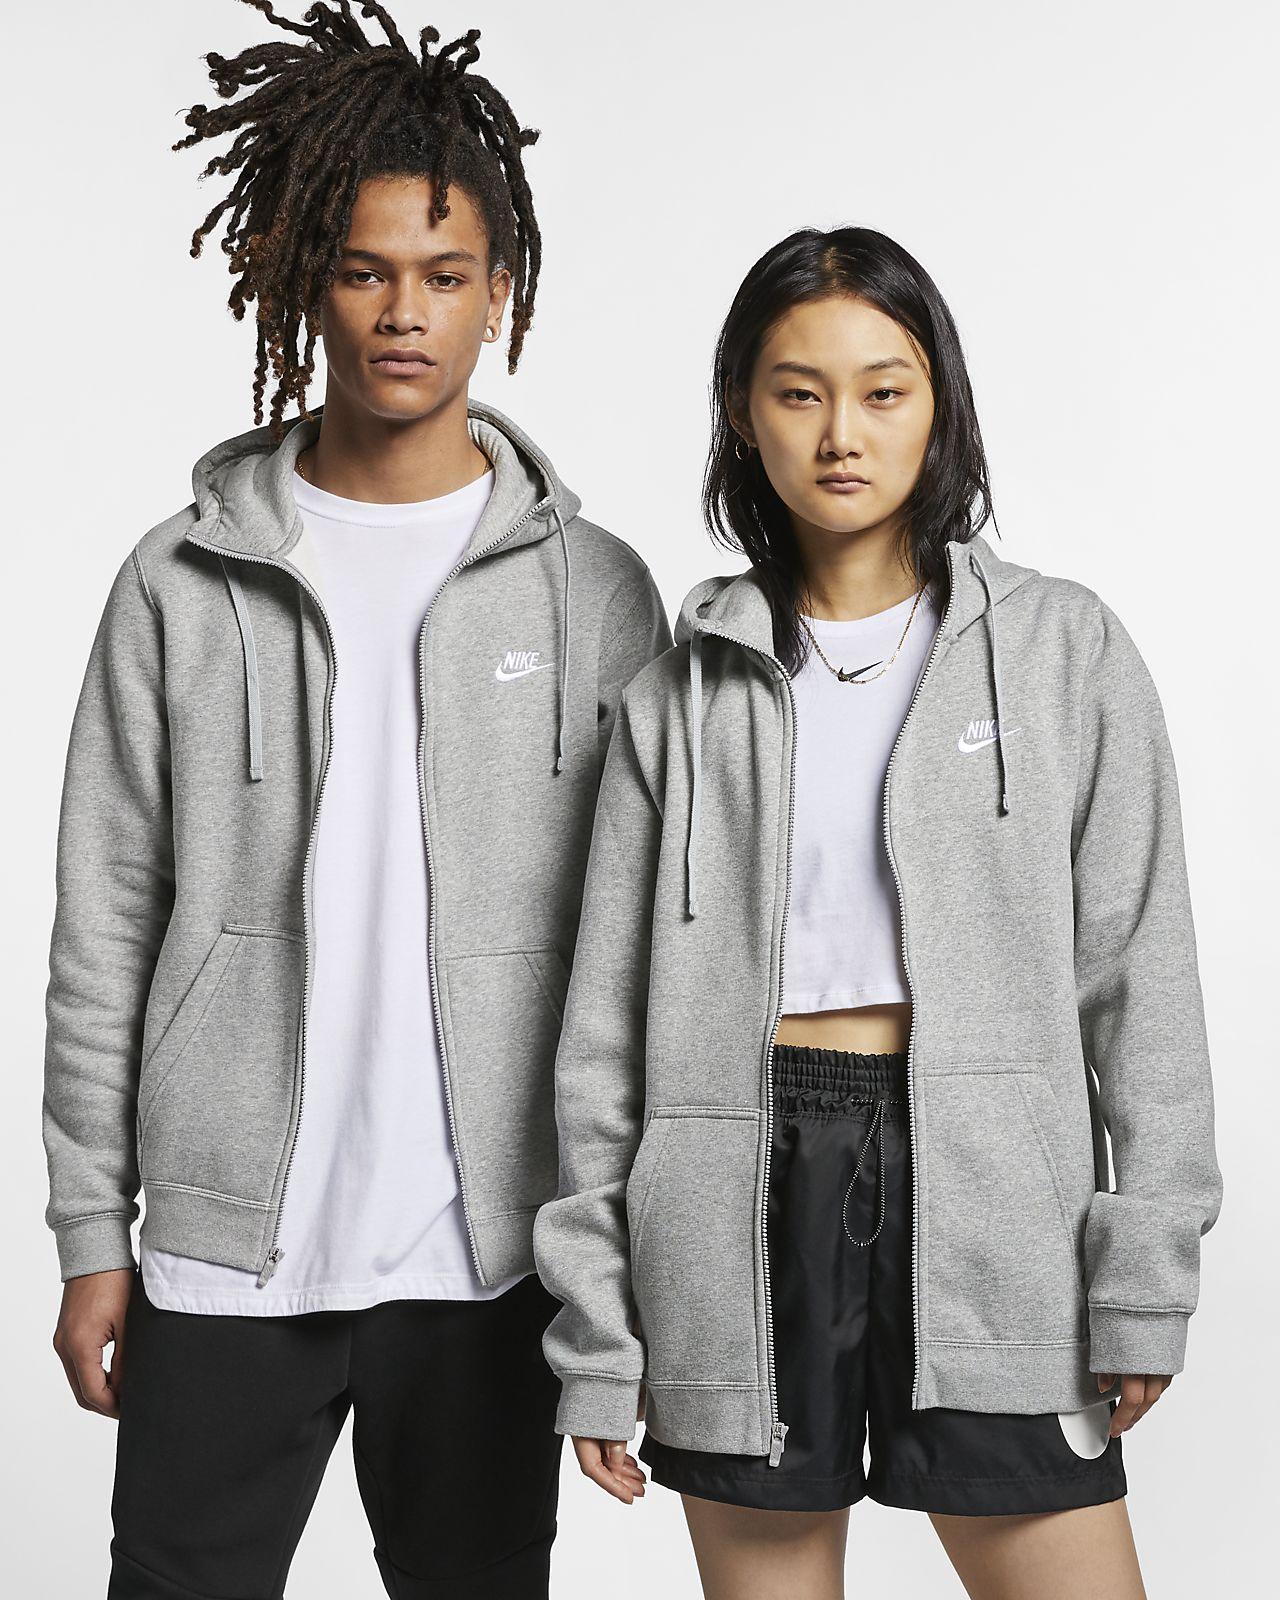 Nike Girls NSW Full Zip Hoodie Carbon Heather//White Medium